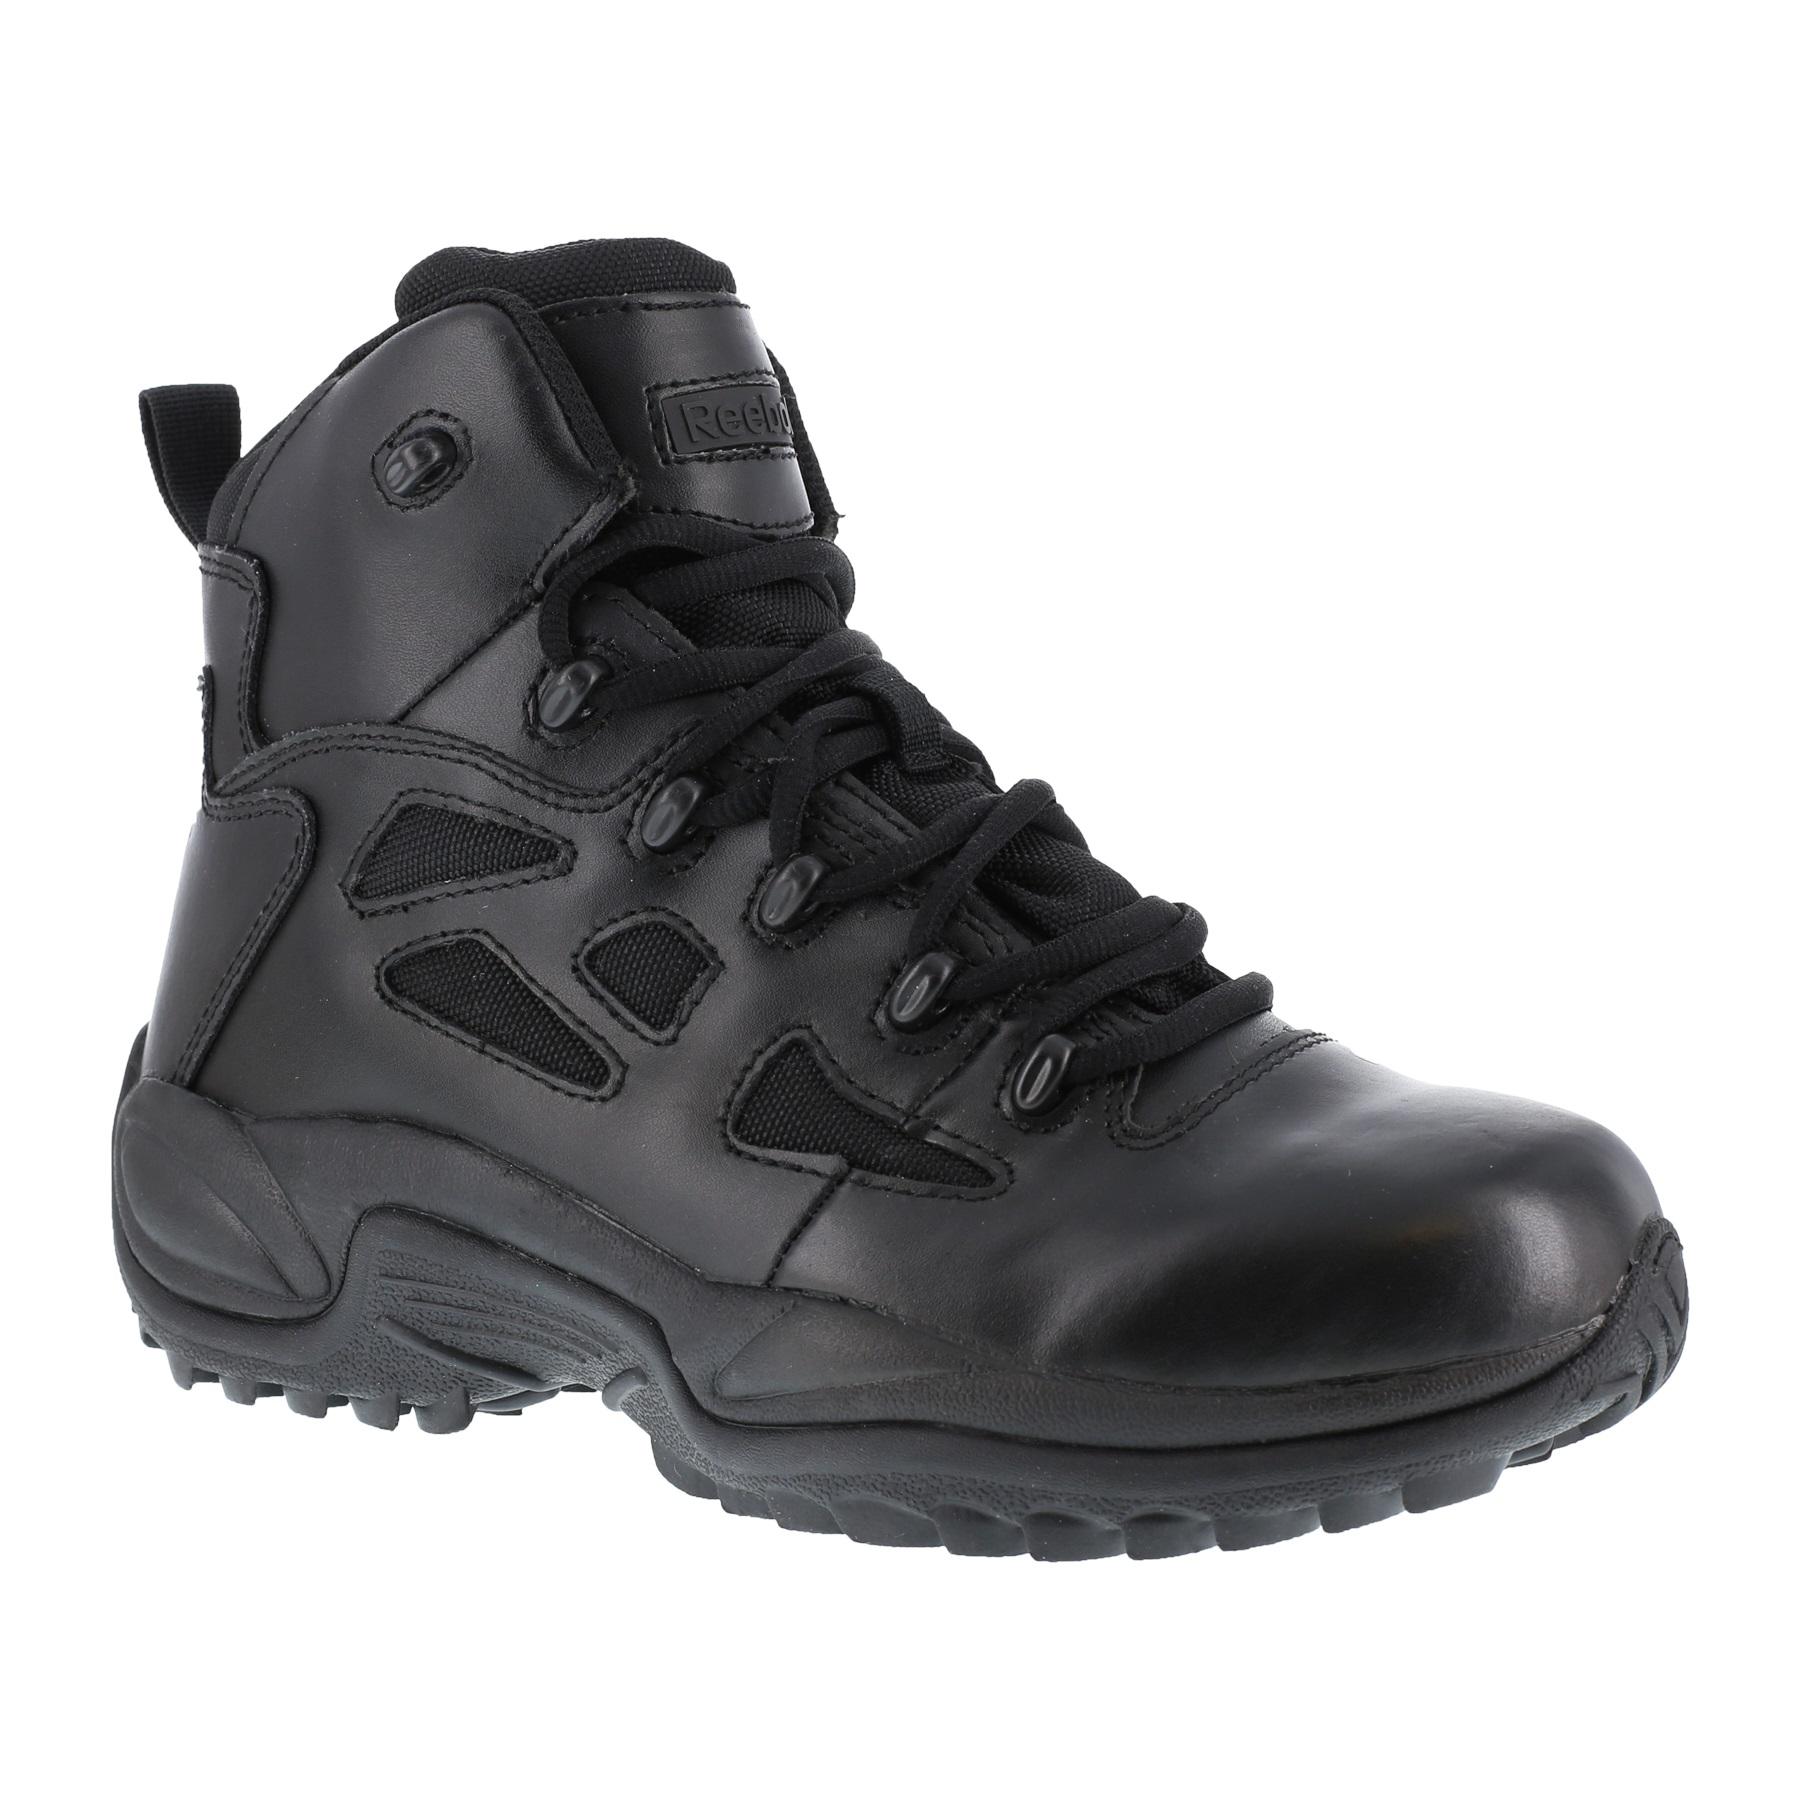 Reebok Rapid Response Black WP Military Boot  2444611cd